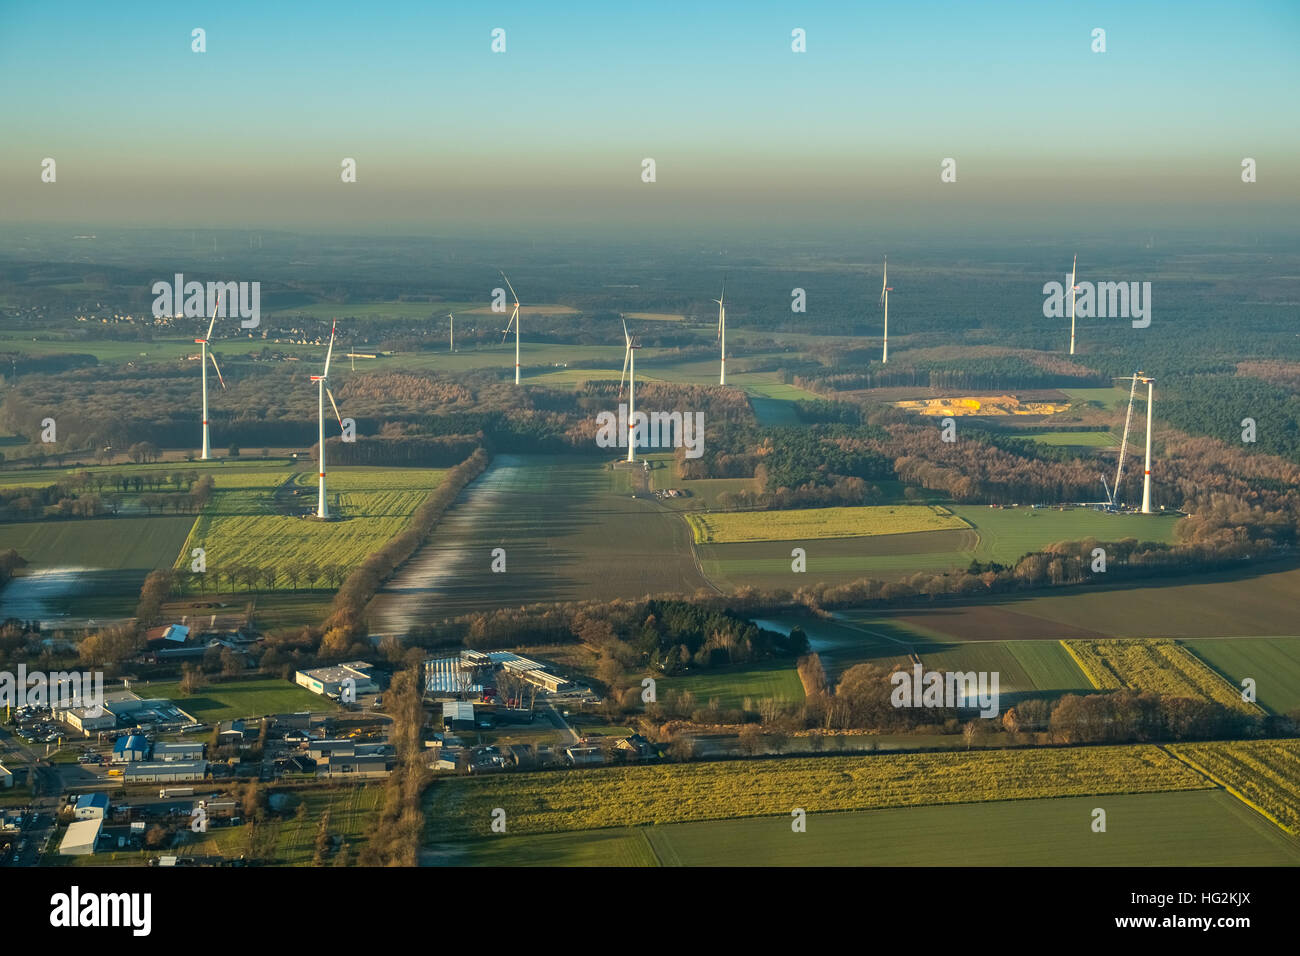 Aerial view, wind power plant, wind farm Uphusen between Lavesumer street and Münsterstraße, construction - Stock Image